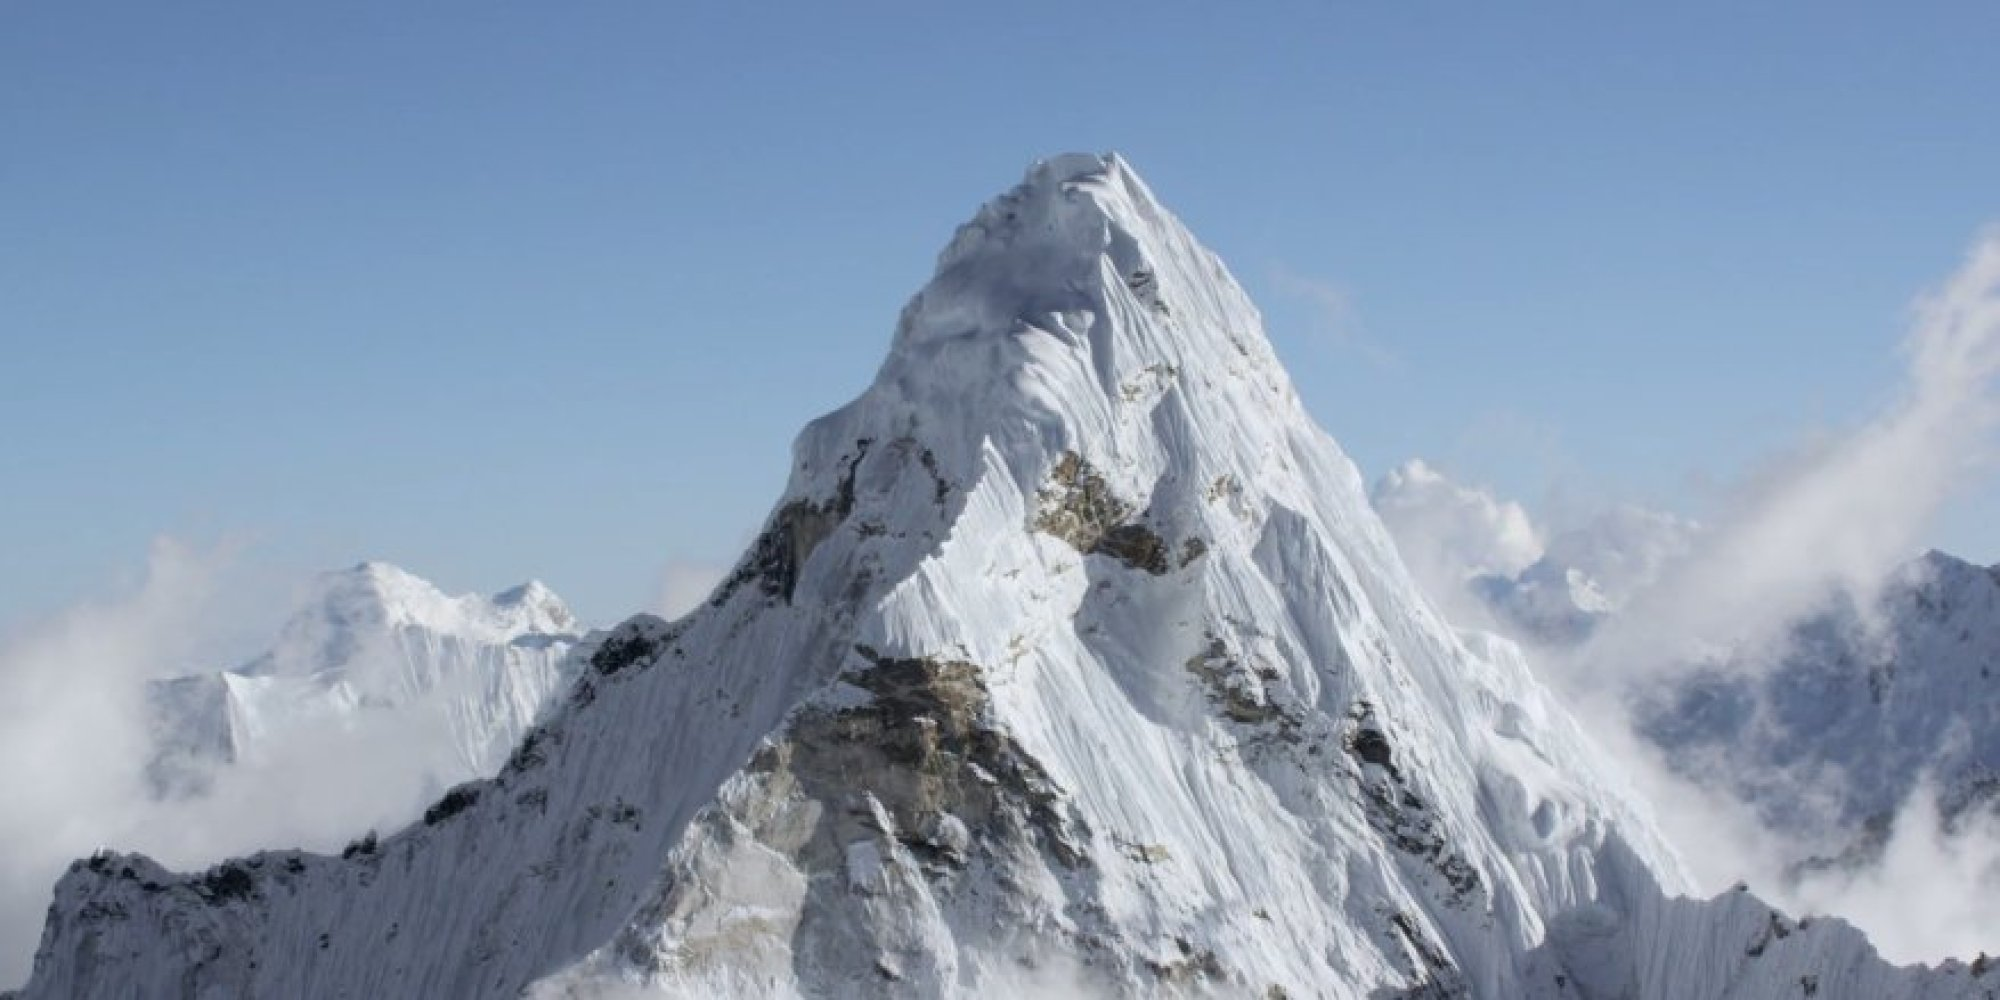 Mount Everest In 4k From 20 000 Feet